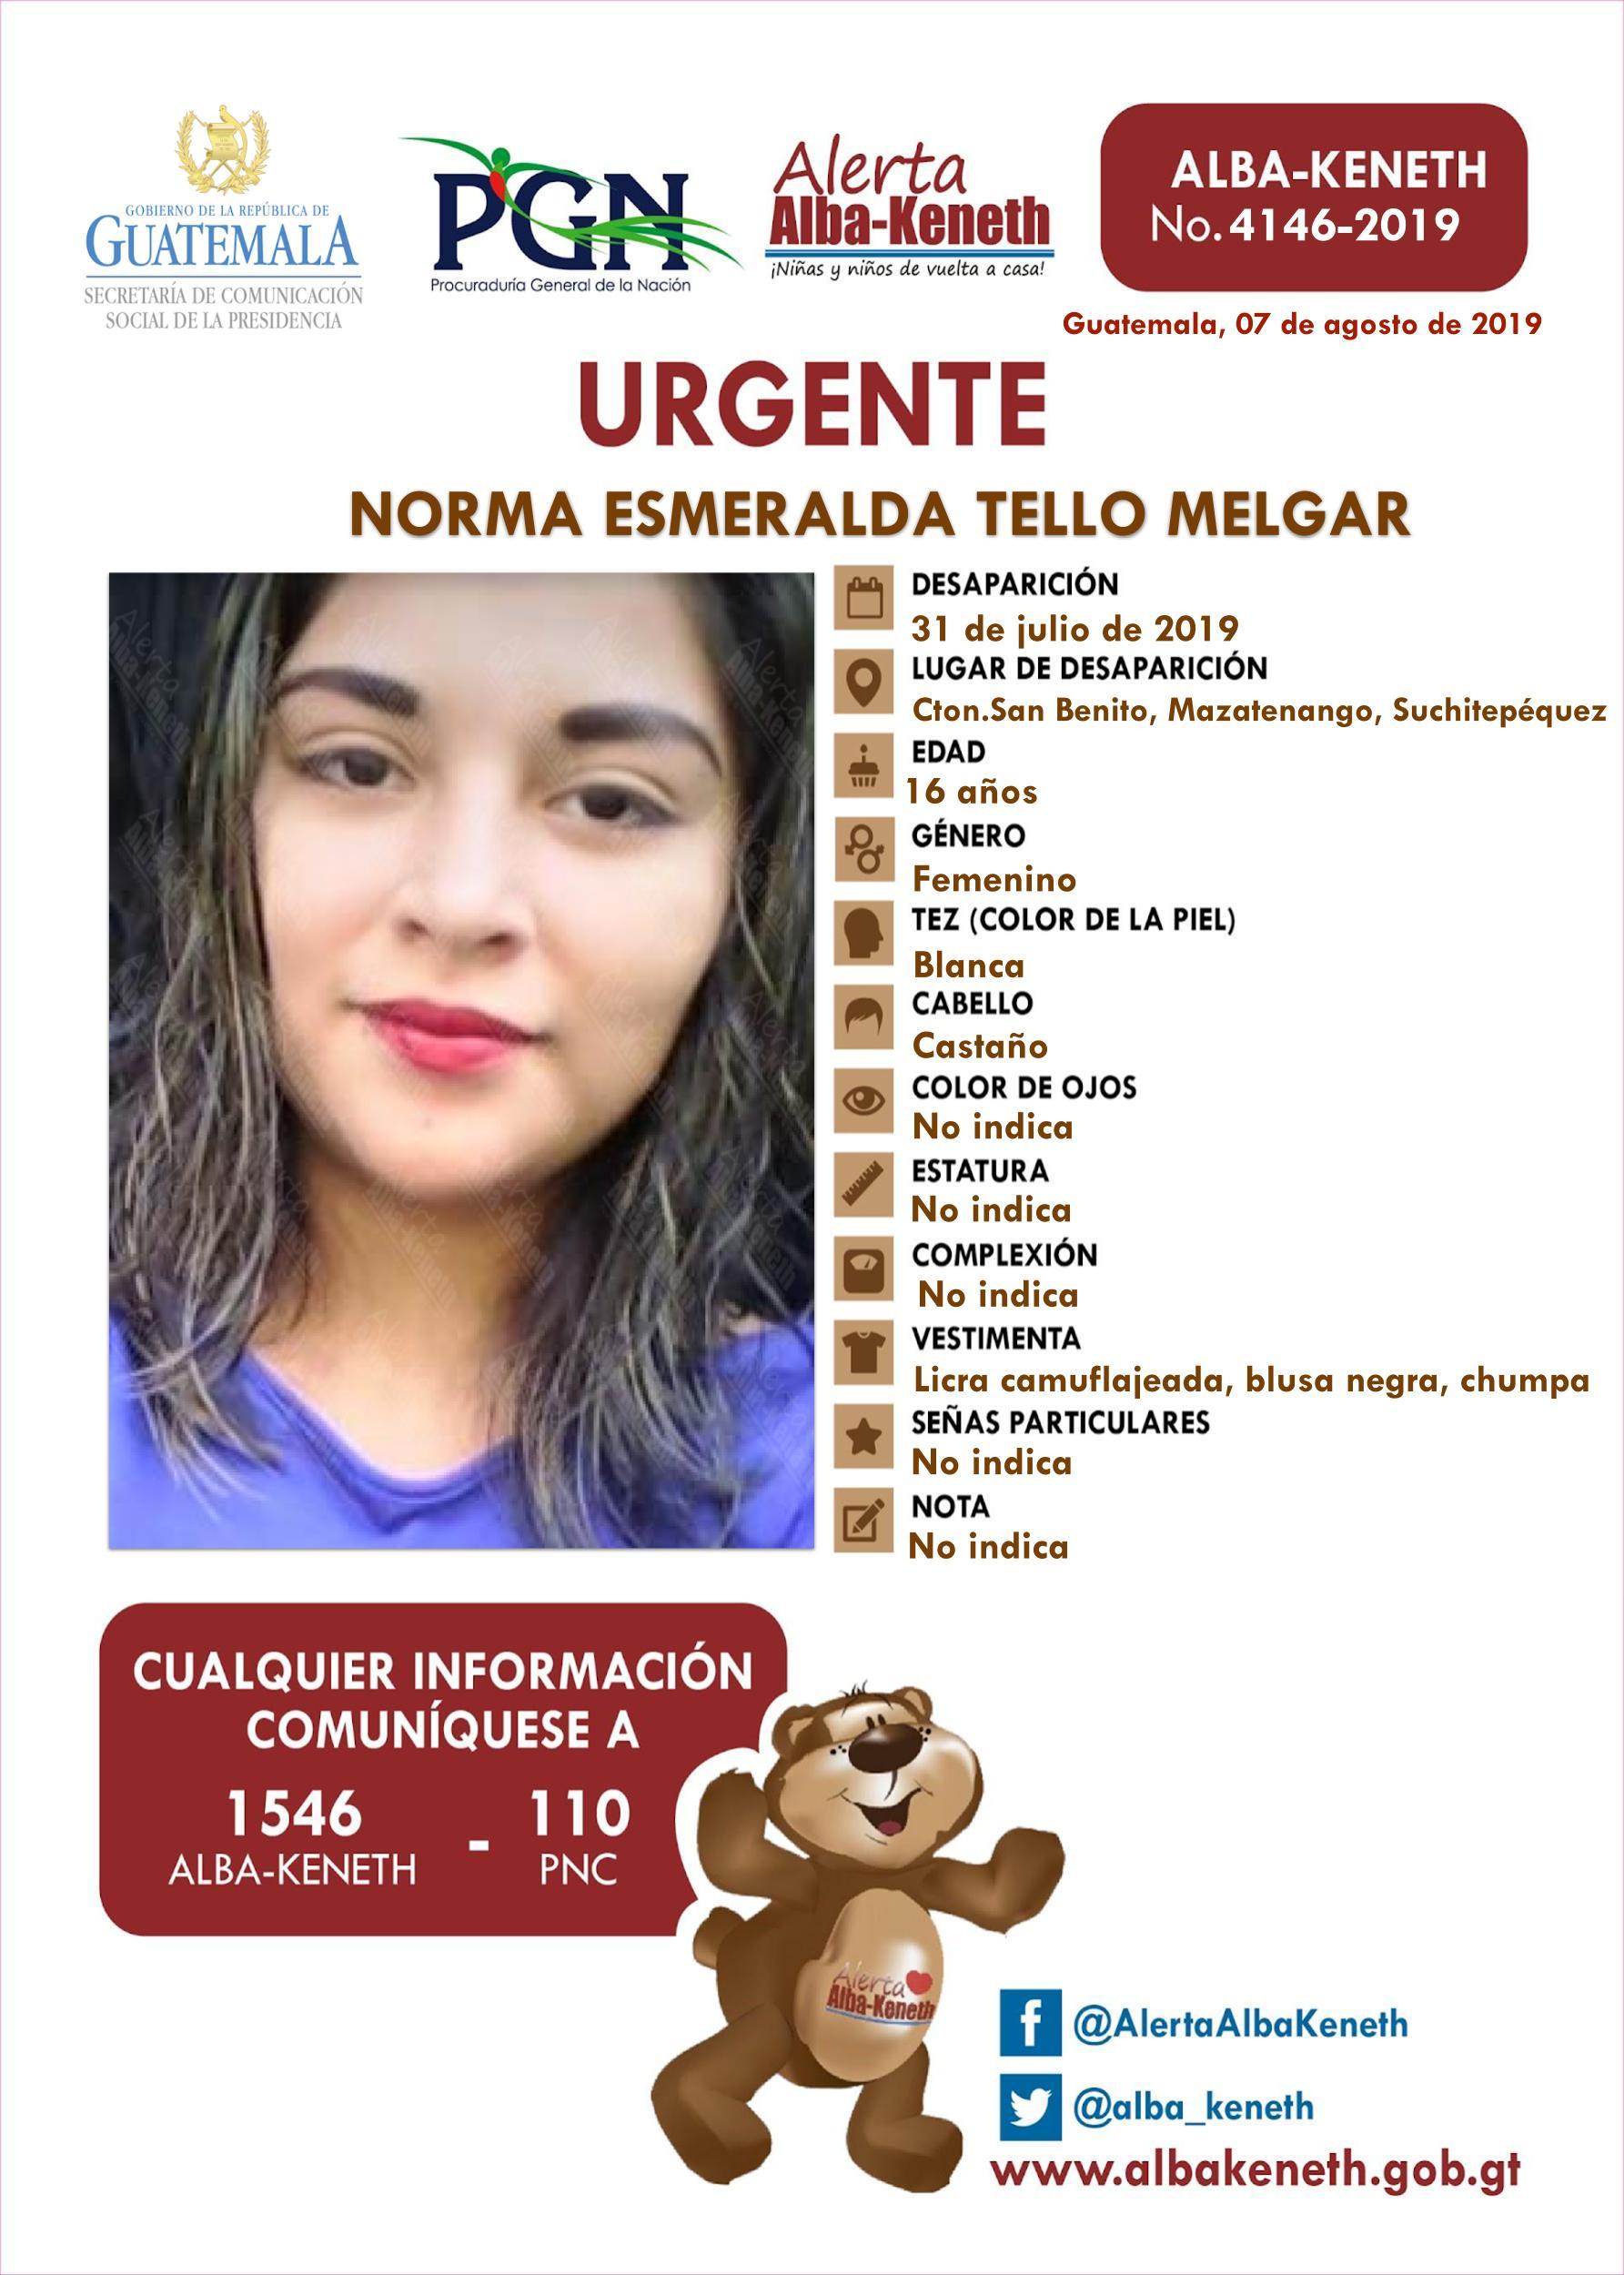 Norma Esmeralda Tello Melgar